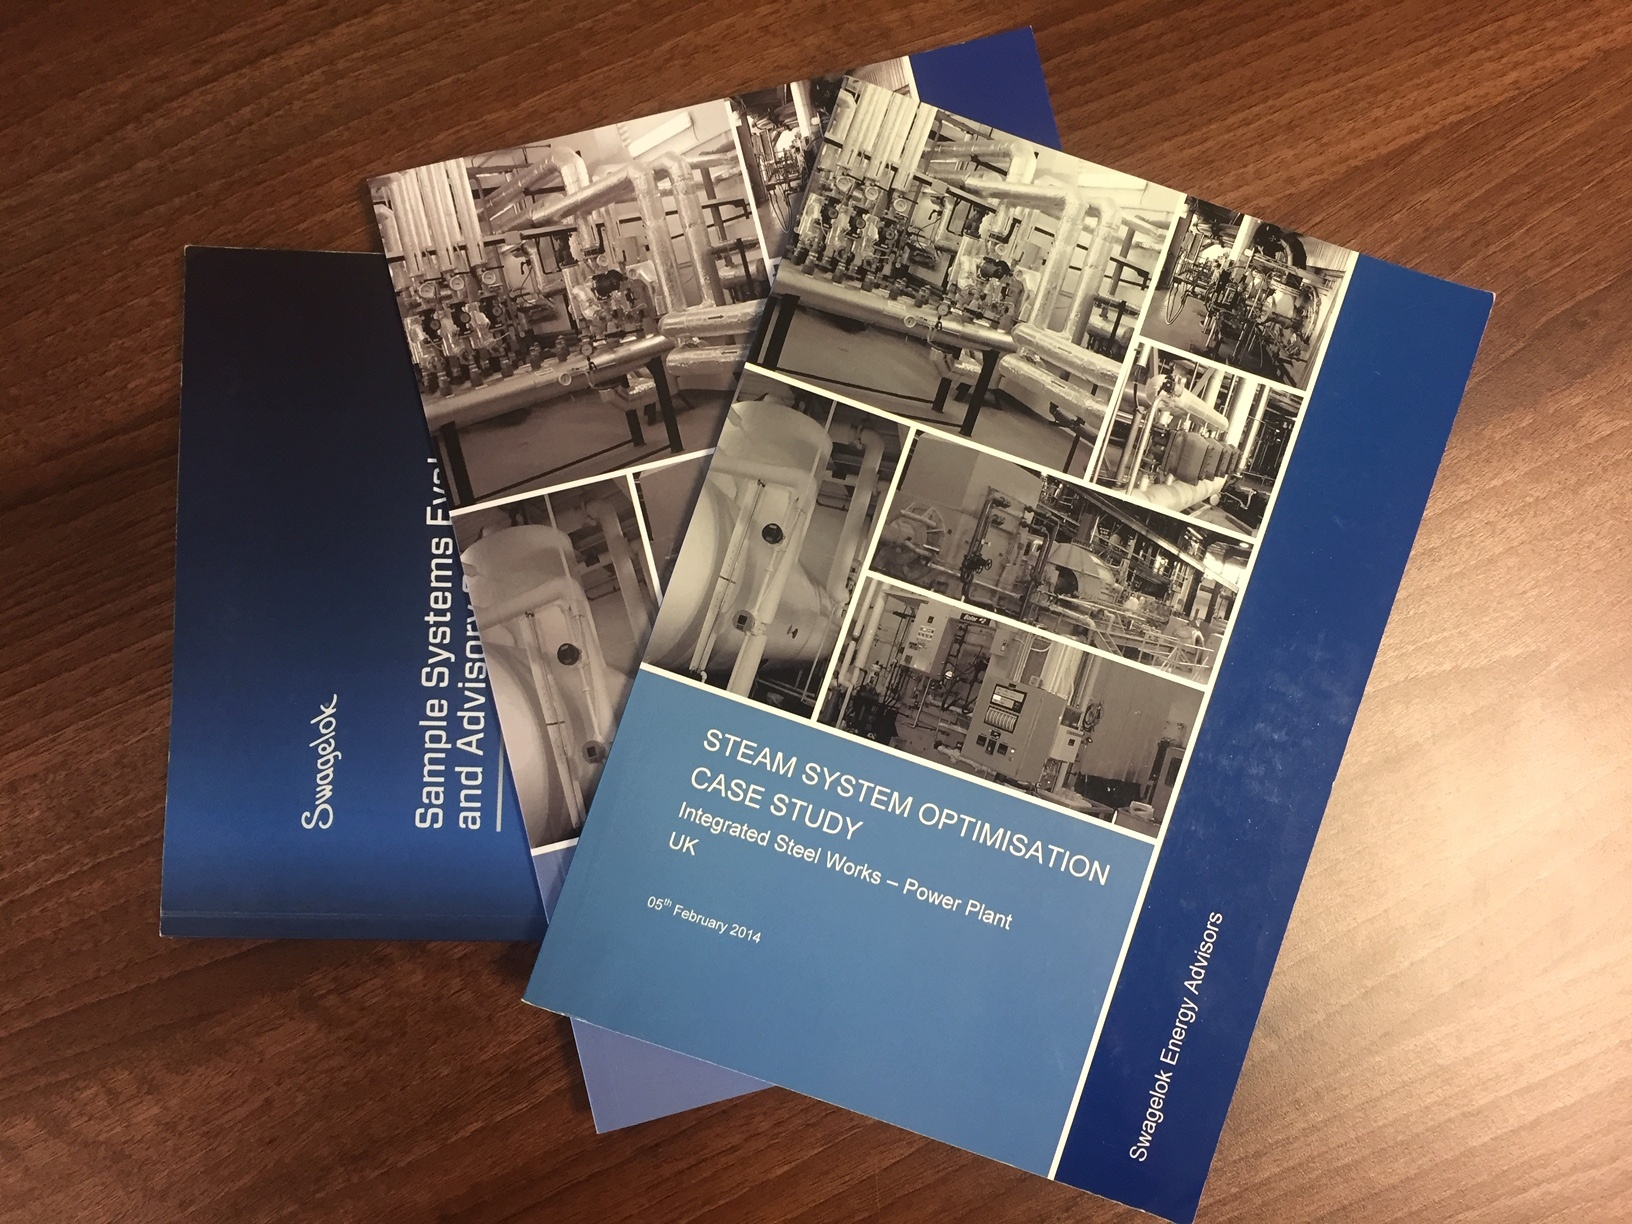 Swagelok Bristol Evaluation Reports